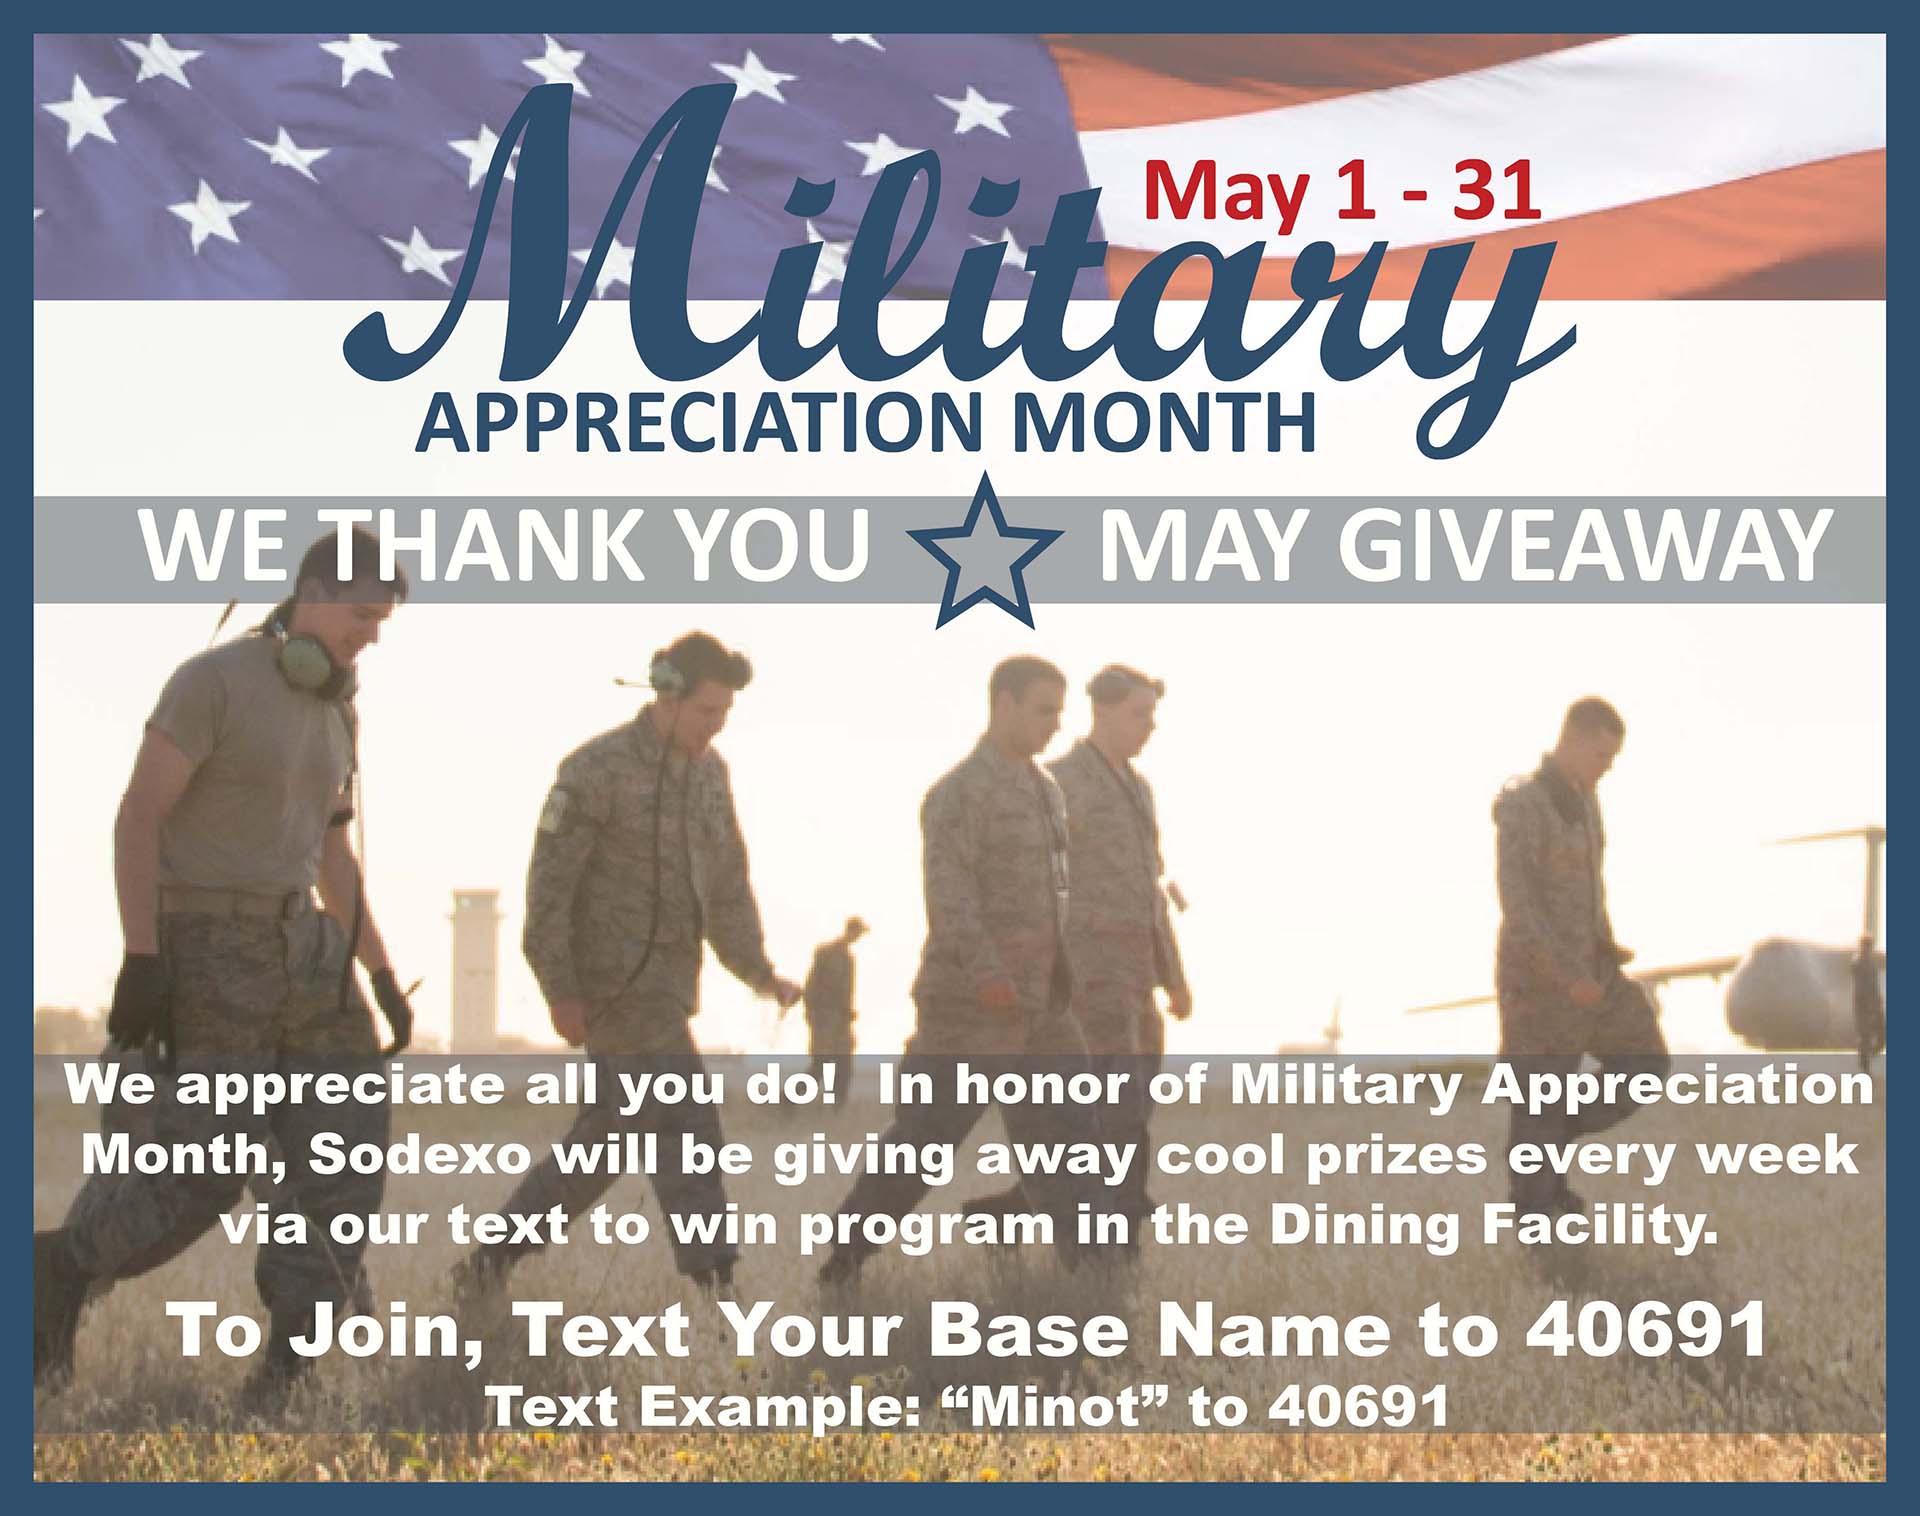 05.01-31 Military Appreciation Month